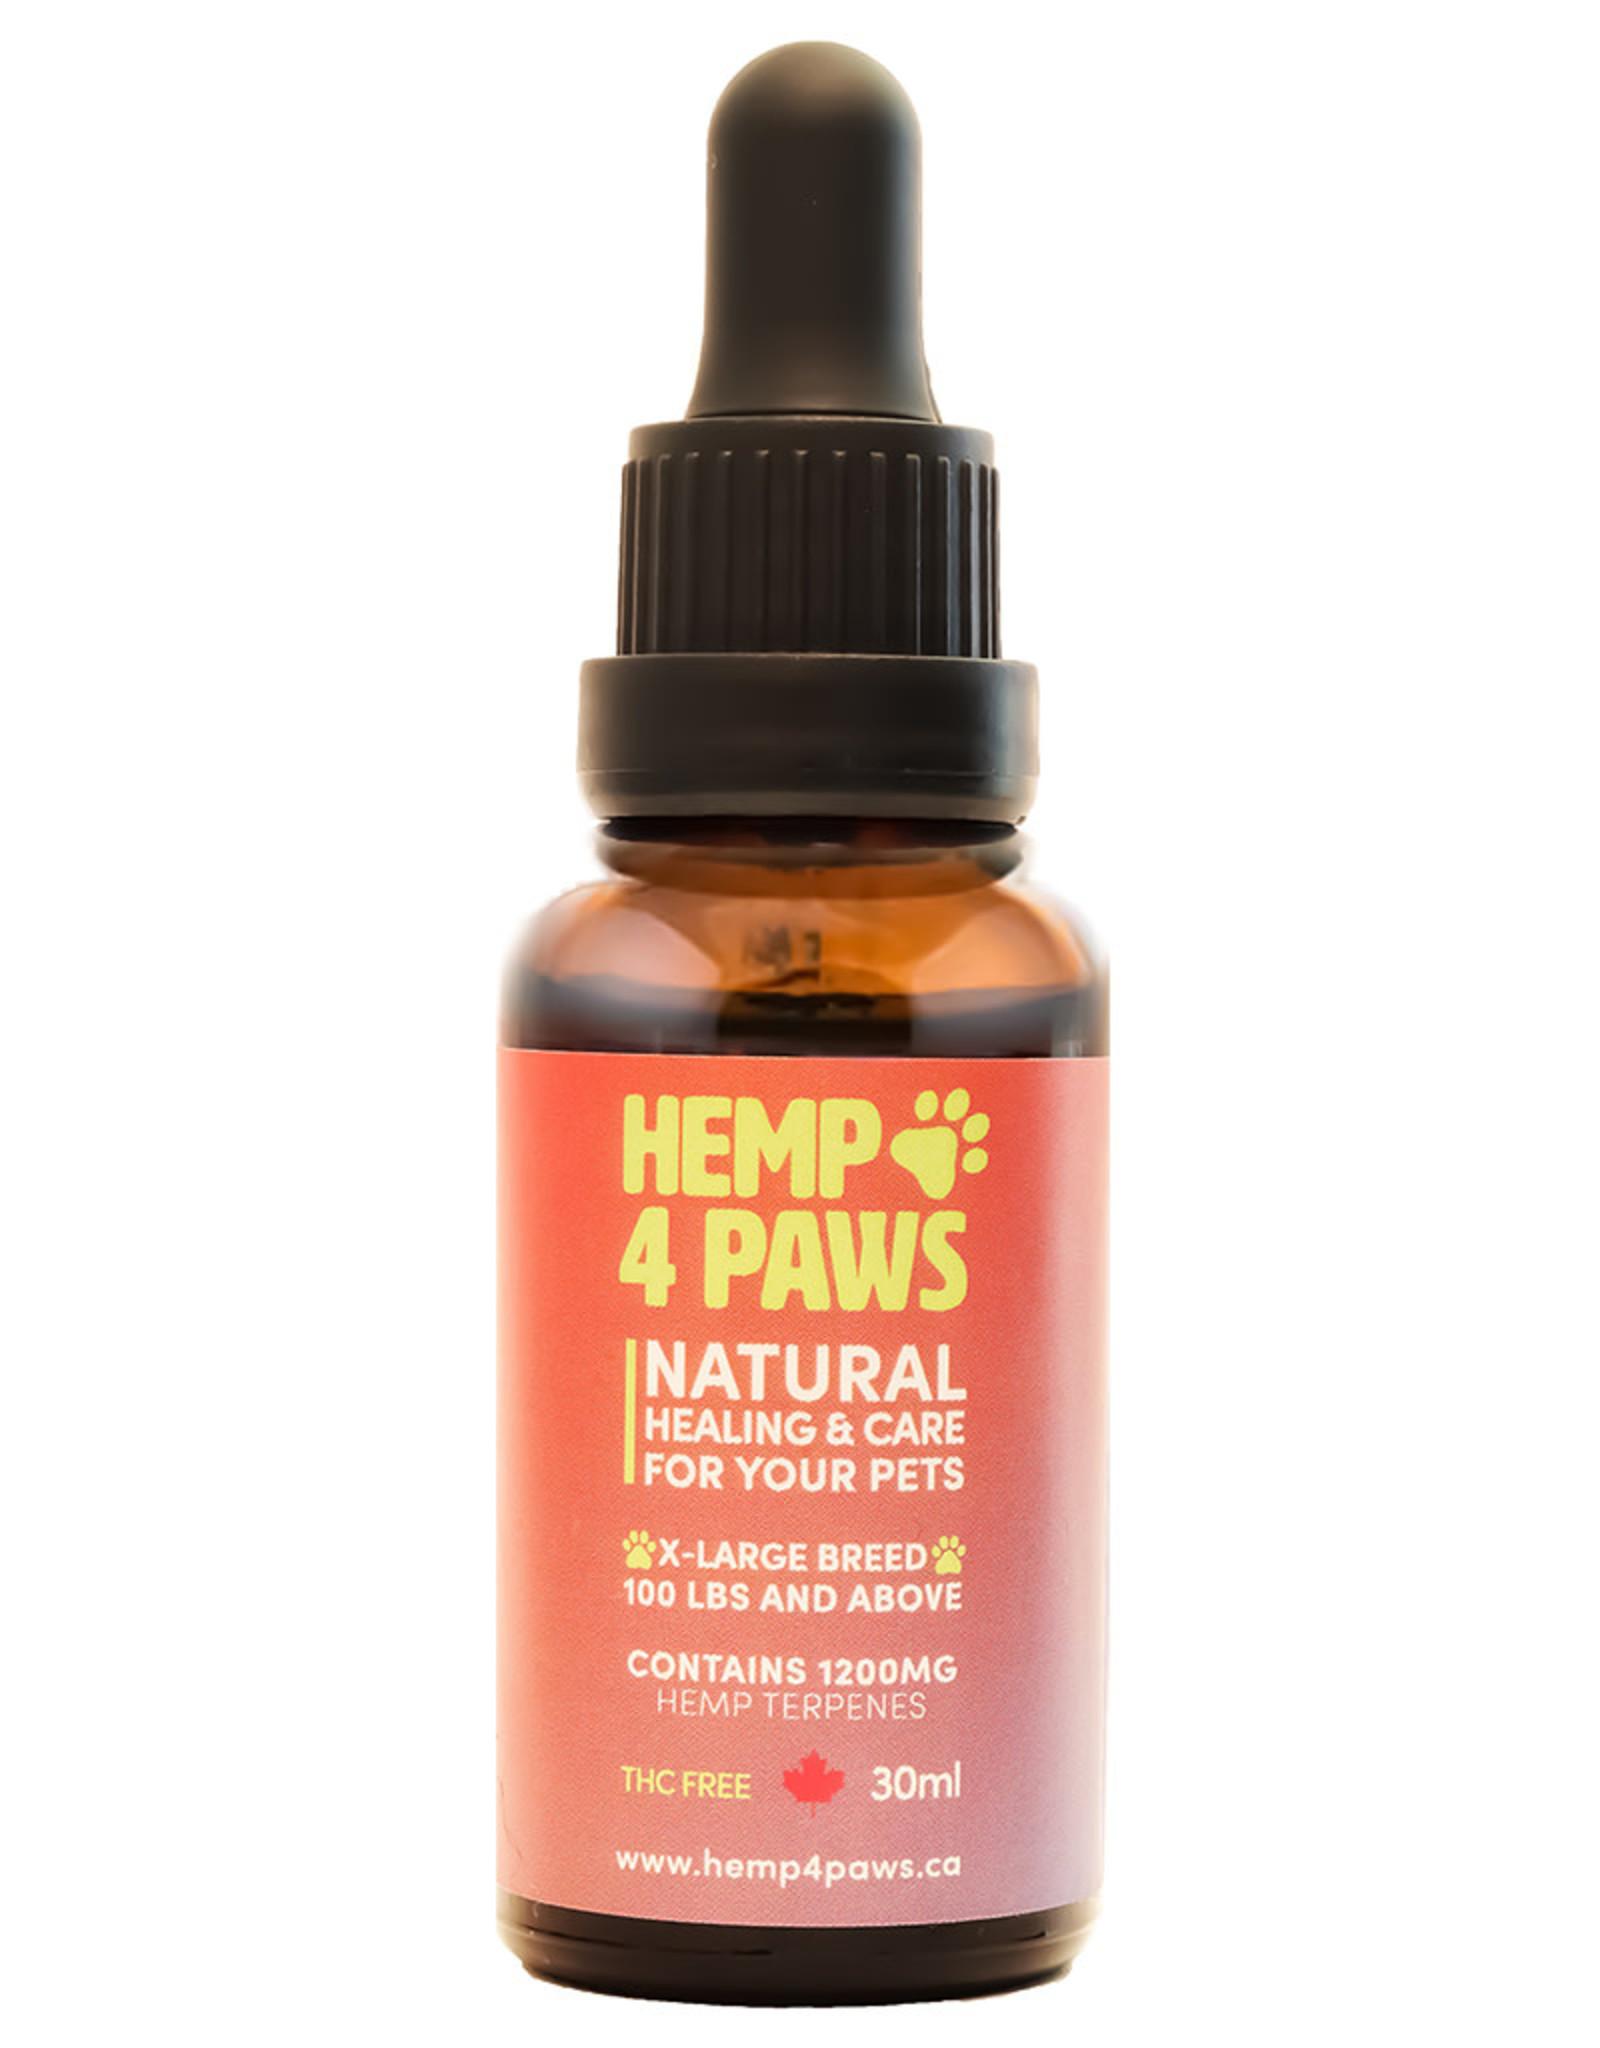 Hemp 4 Paws Hemp Terpene Oil - Large Breed